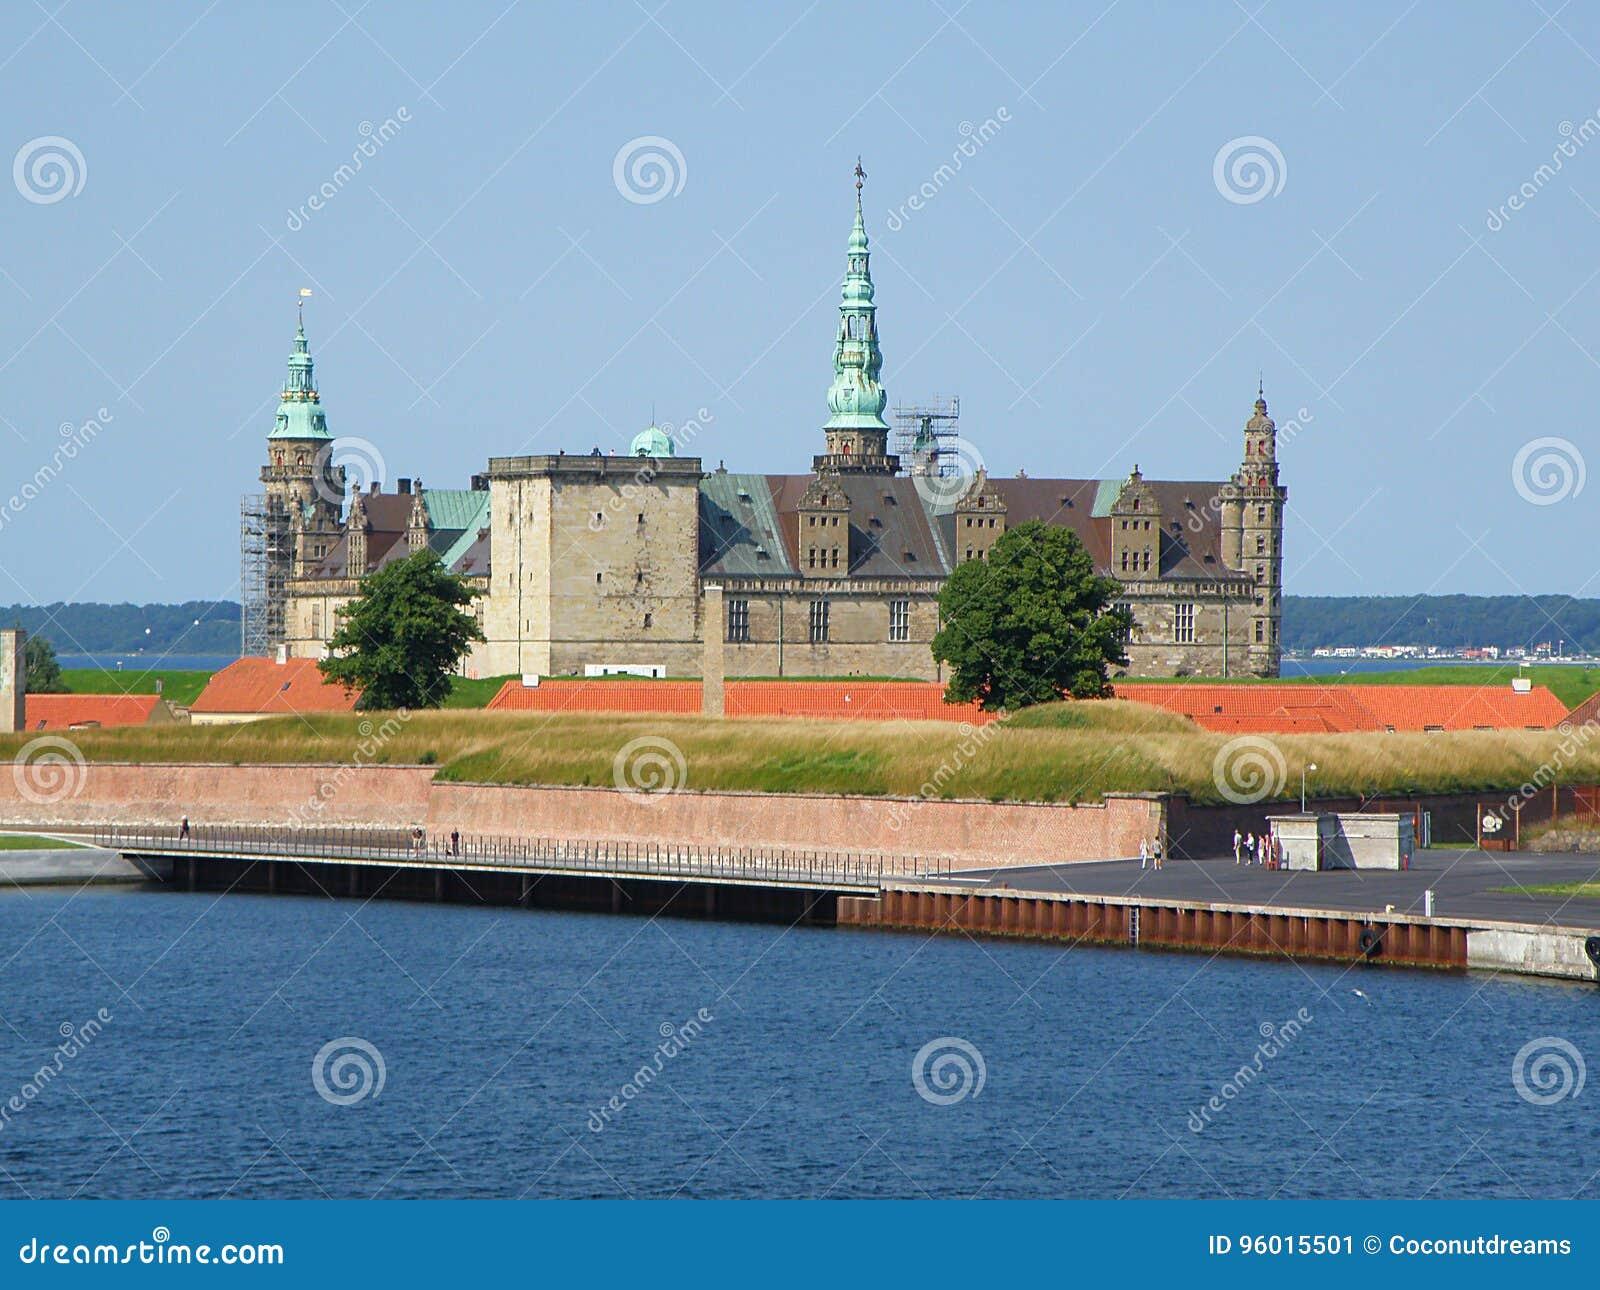 Kronborg ενάντια στον ηλιόλουστο μπλε ουρανό, περιοχή παγκόσμιων κληρονομιών της ΟΥΝΕΣΚΟ Helsingor